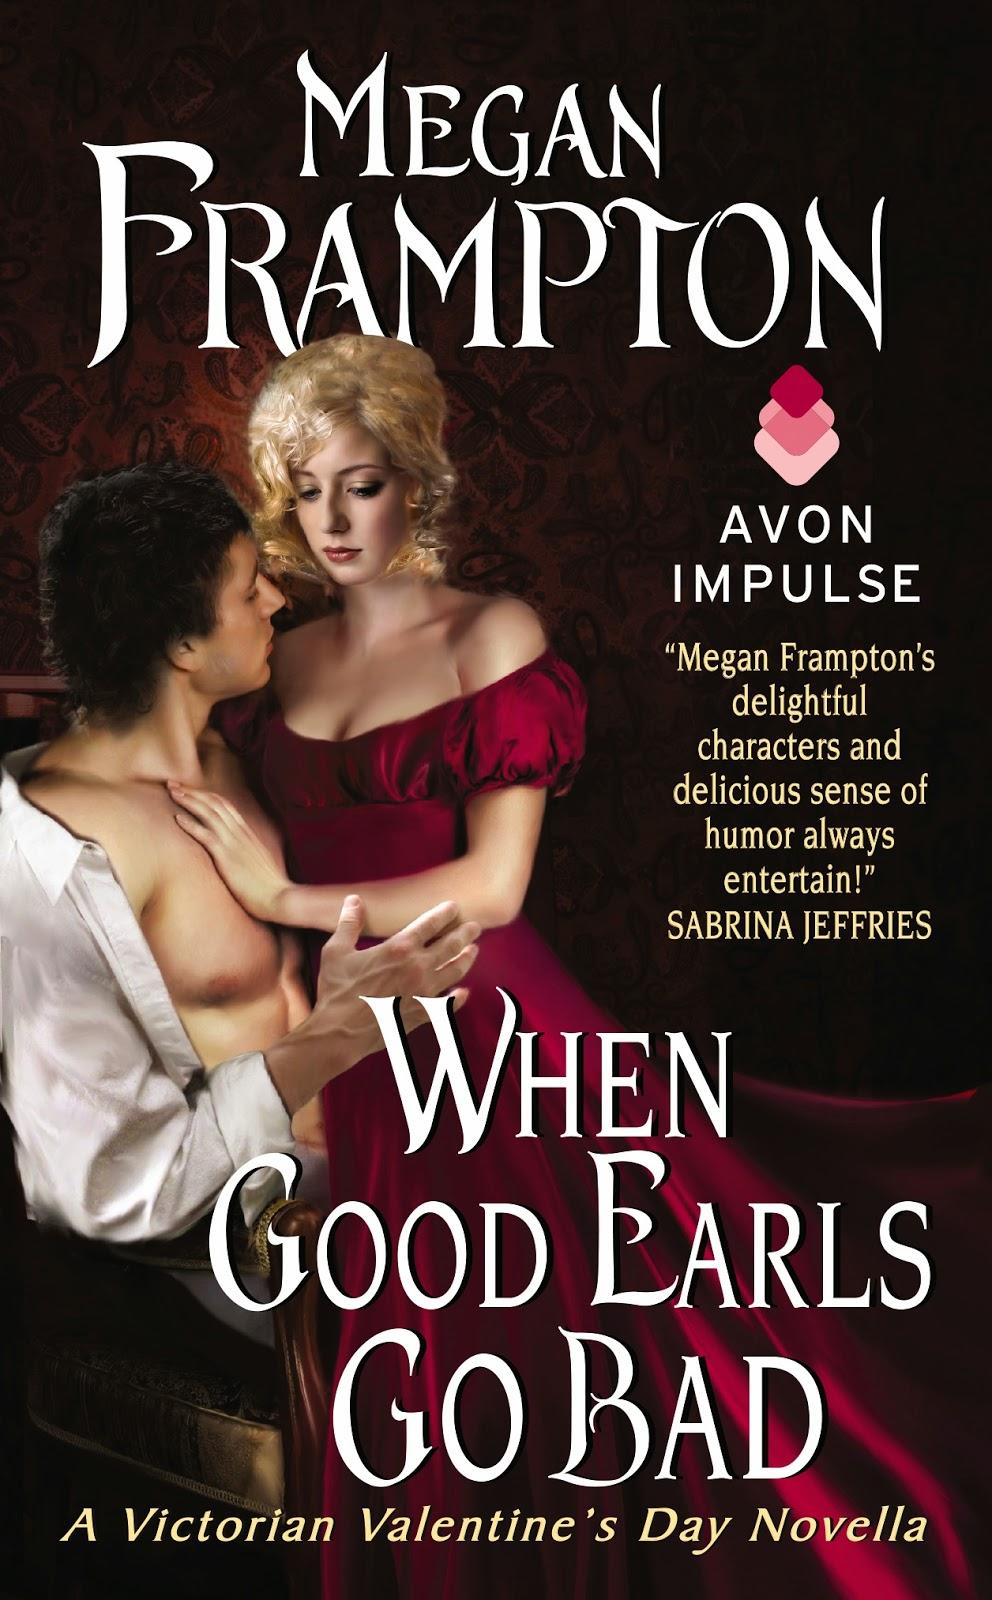 Historical Romance, Victorian Valentine's Day Novella